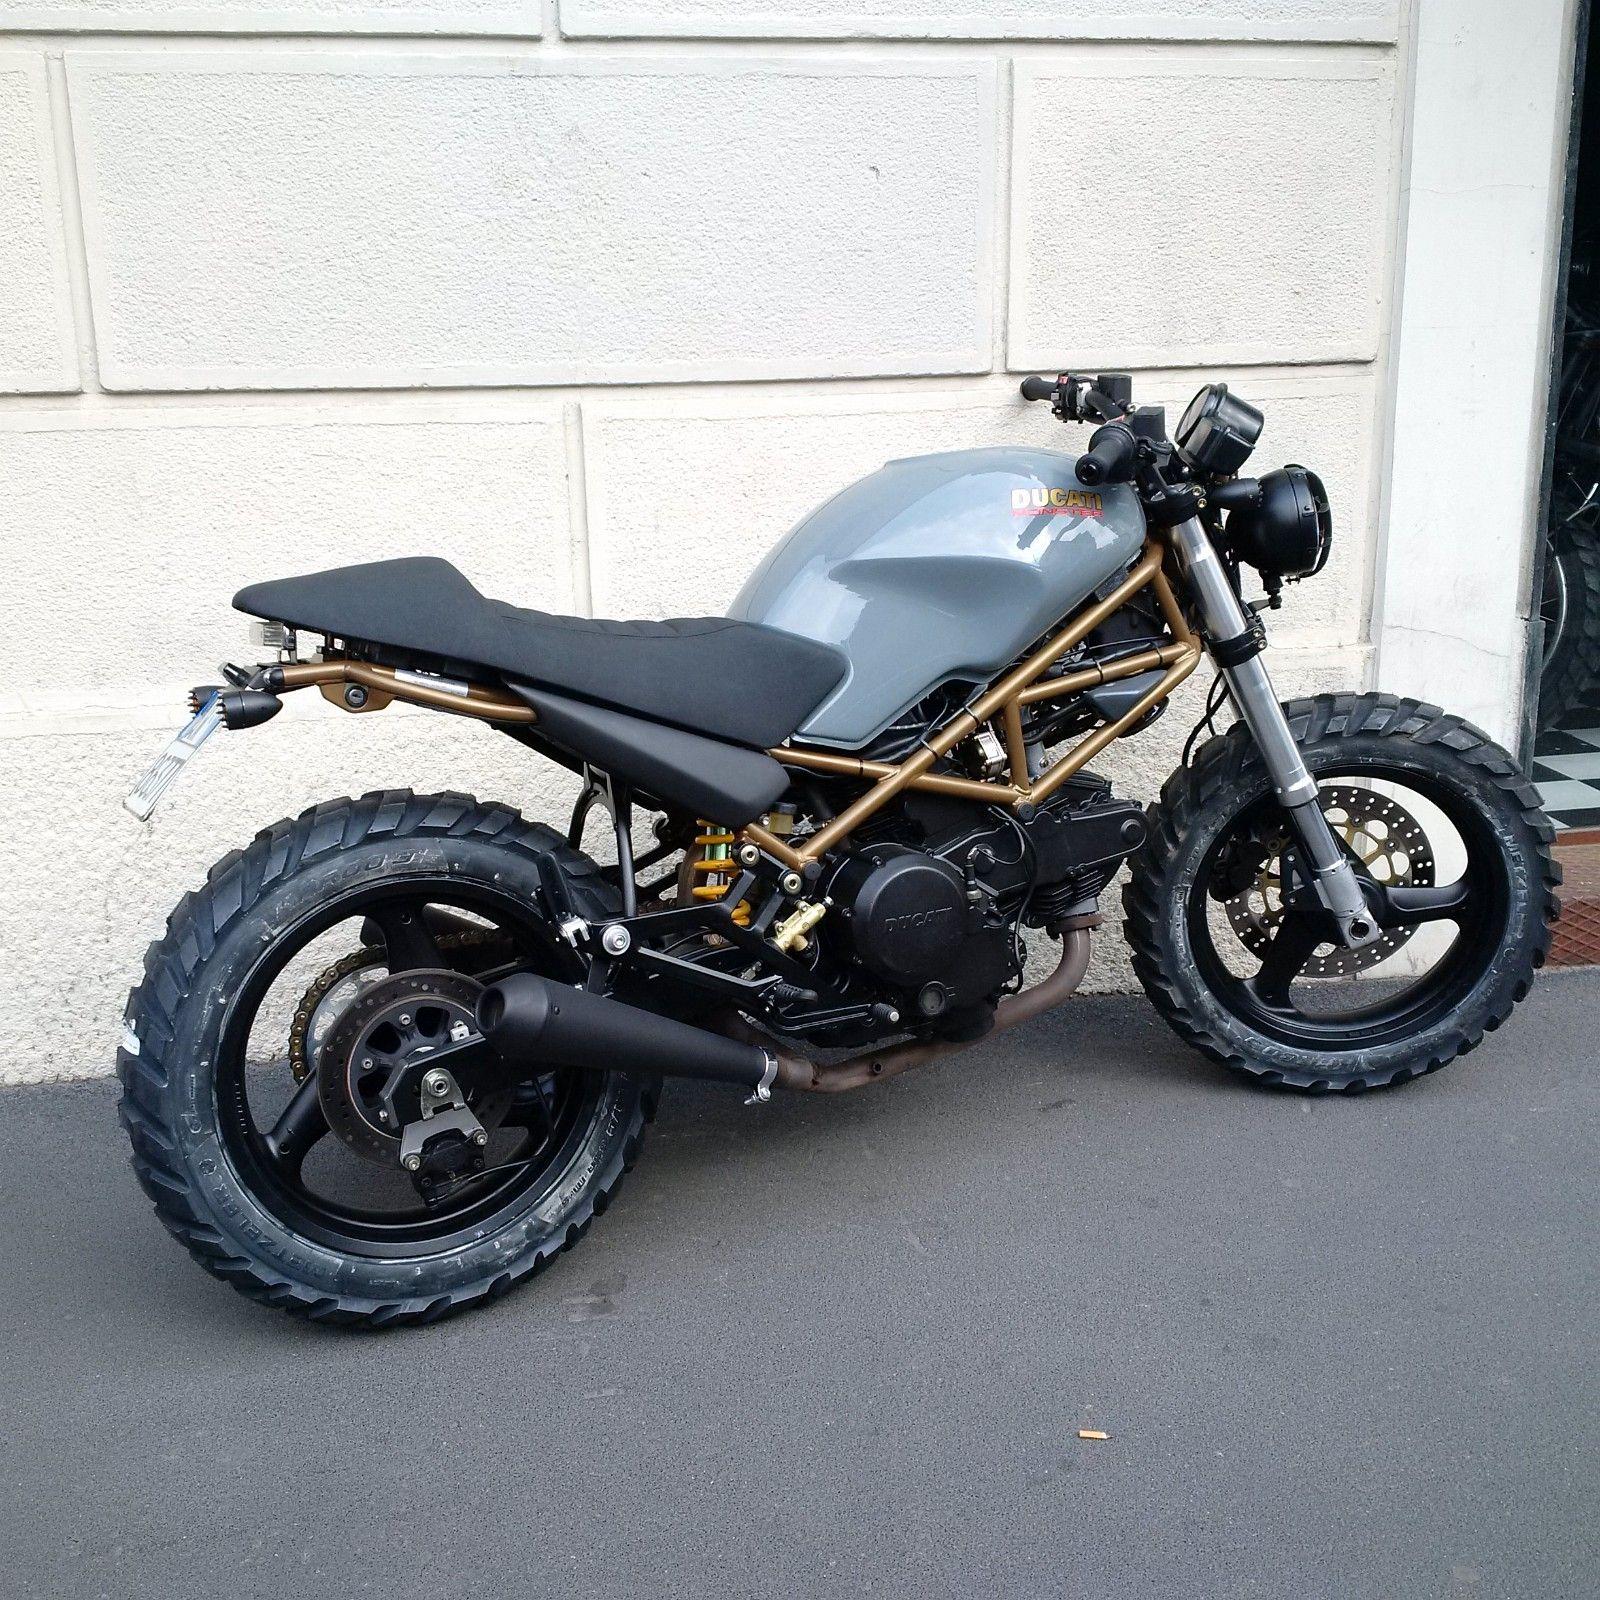 finn ducati monster 600 motorbikes clothing. Black Bedroom Furniture Sets. Home Design Ideas